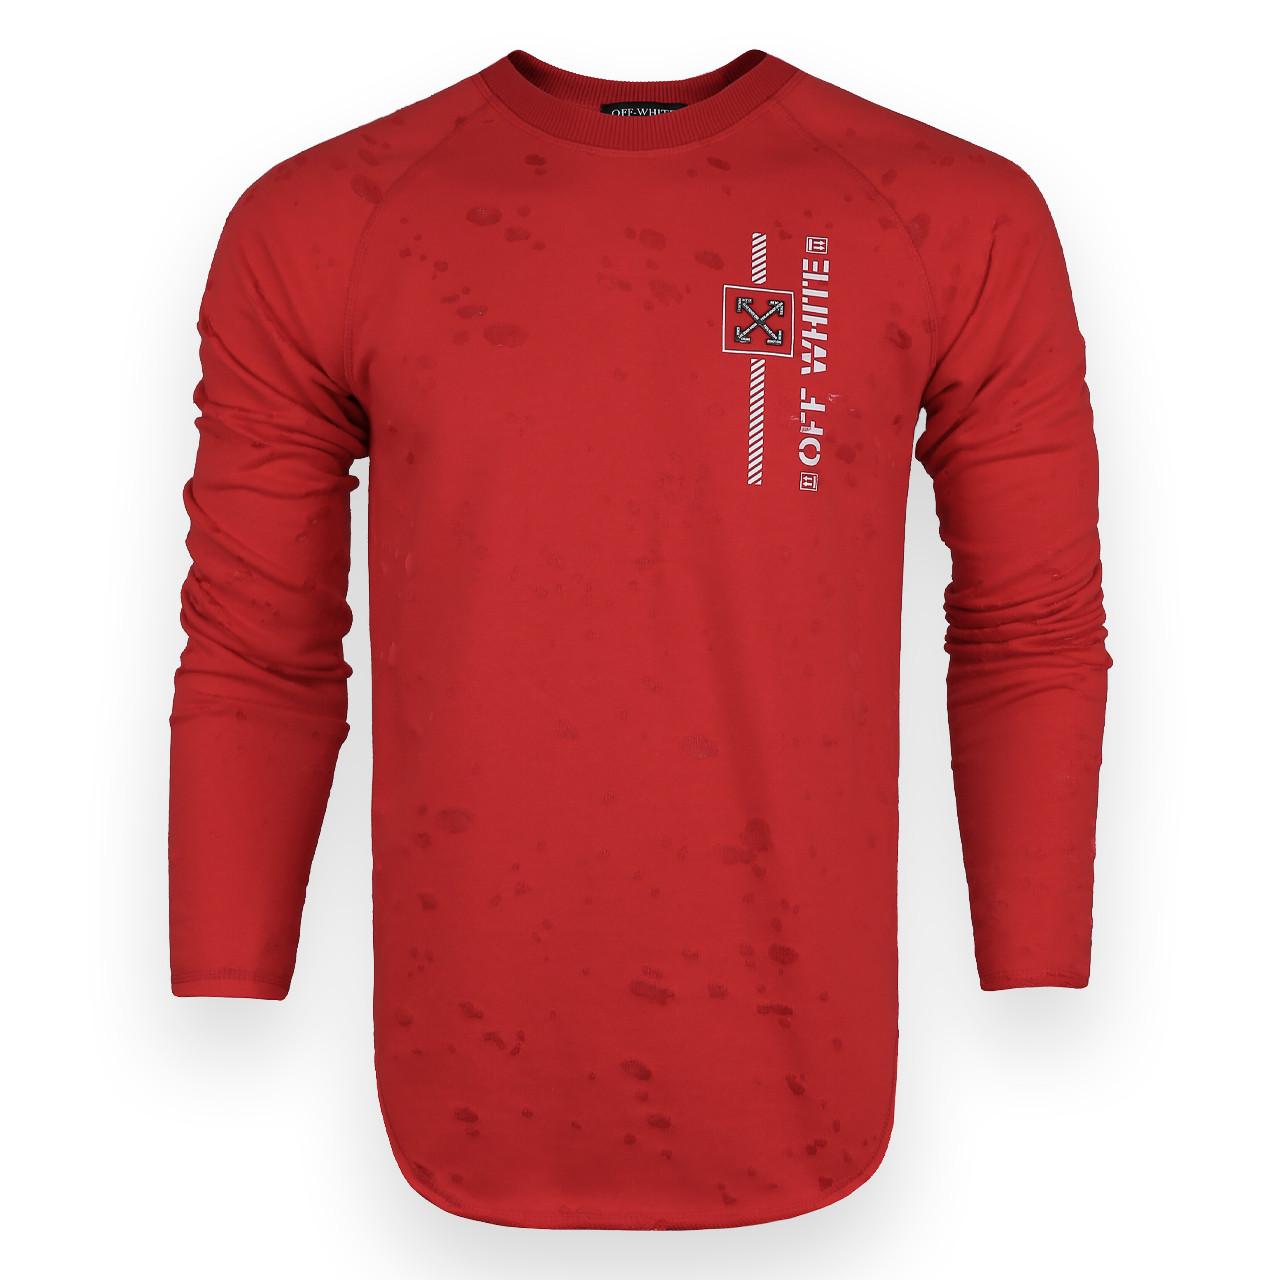 Свитшот мужской красный OFF-WHITE #10 Р-2 RED L(Р) 20-516-212-004